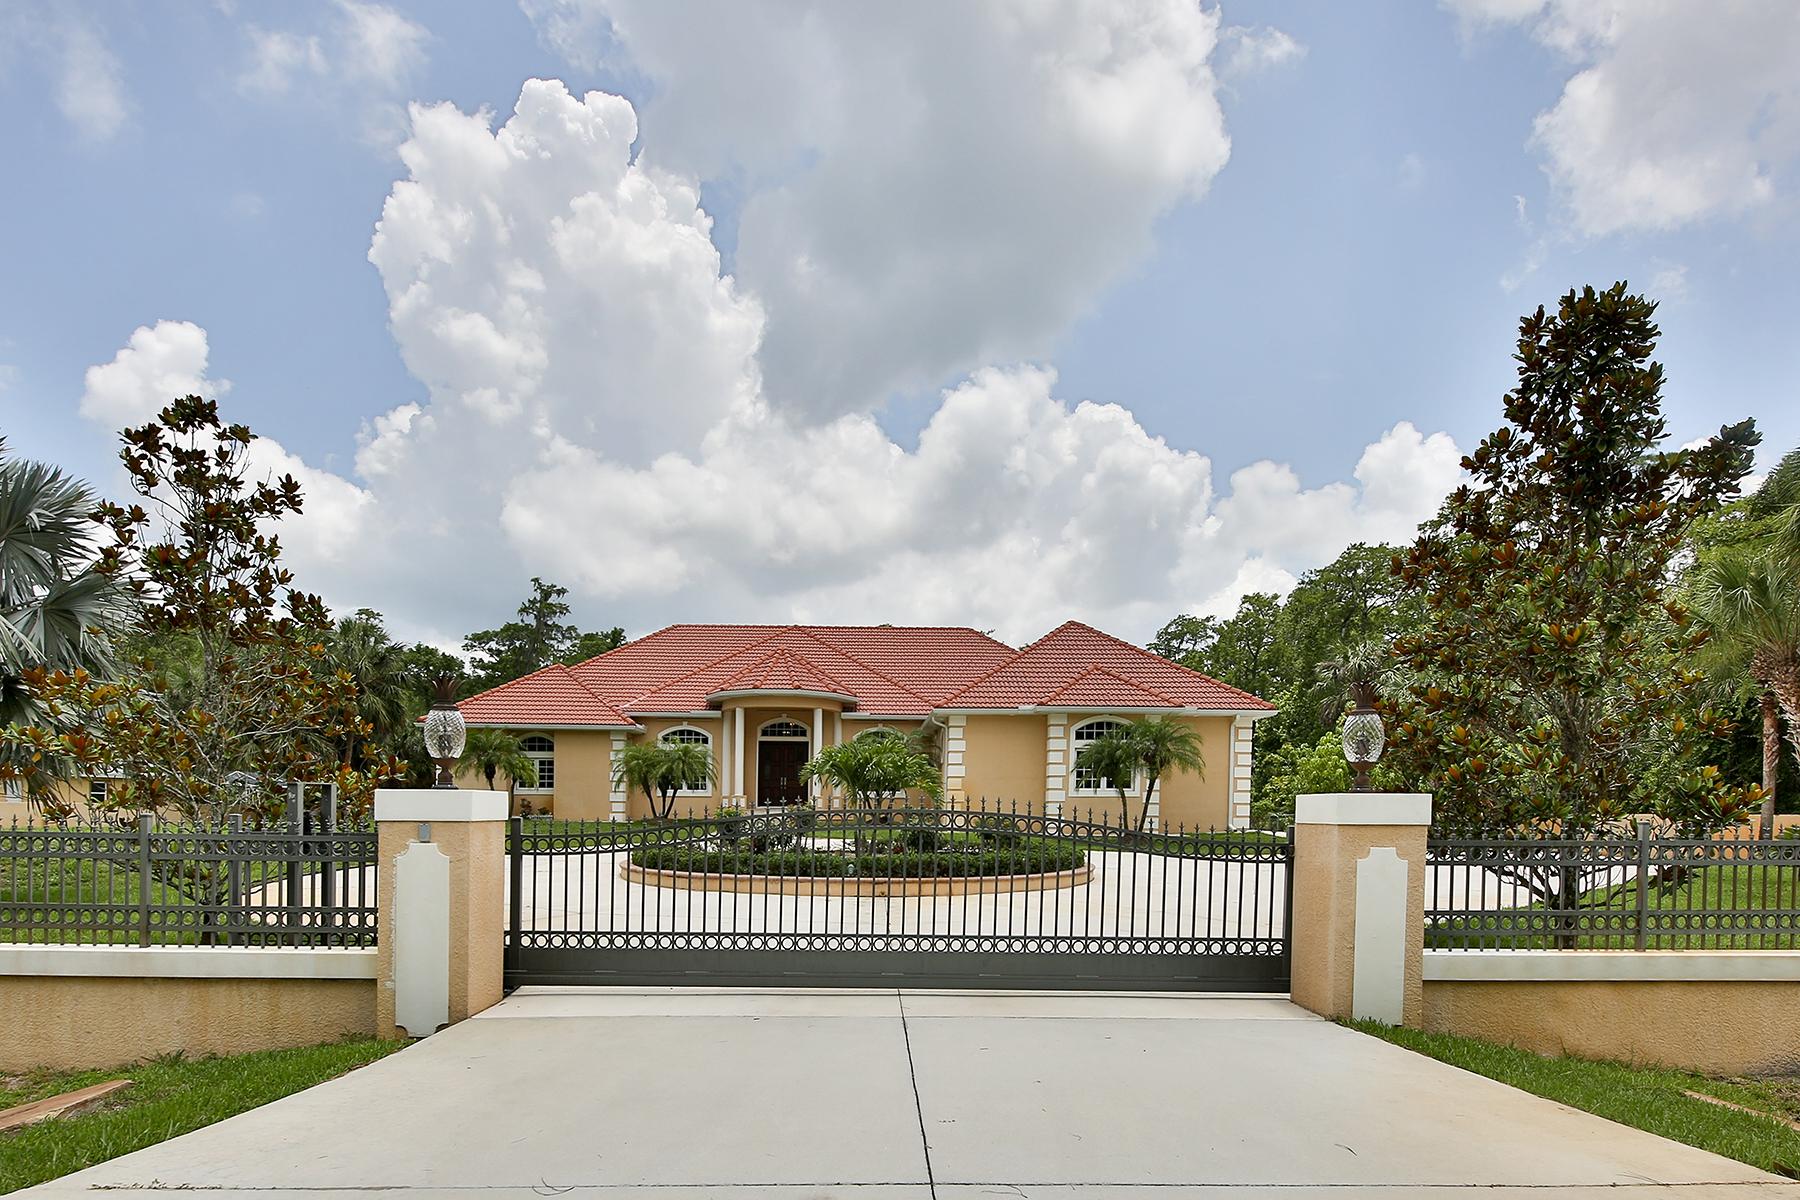 Vivienda unifamiliar por un Venta en GOLDEN GATE ESTATES 4244 1st Ave NW Naples, Florida, 34119 Estados Unidos